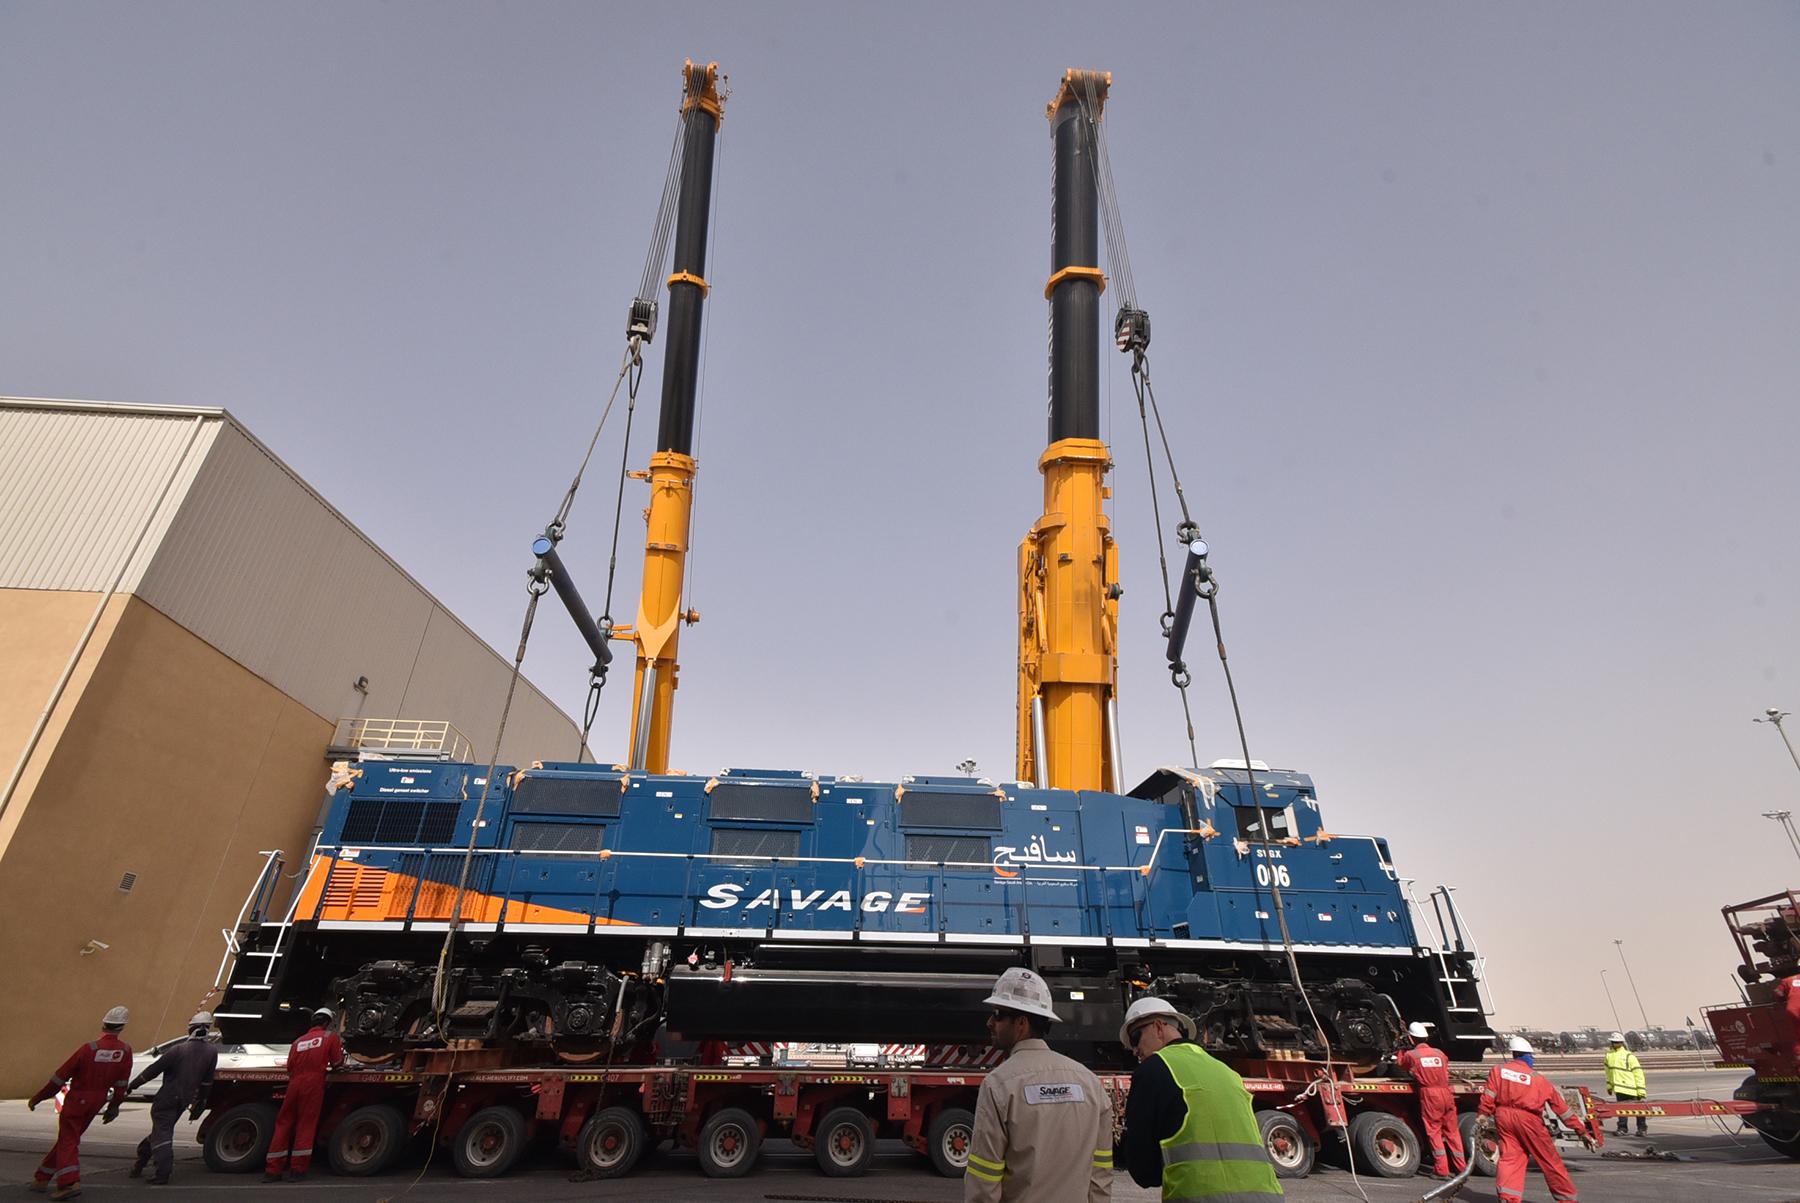 Savage Saudi Arabia supplies locomotives to Saudi Aramco, MWSPC